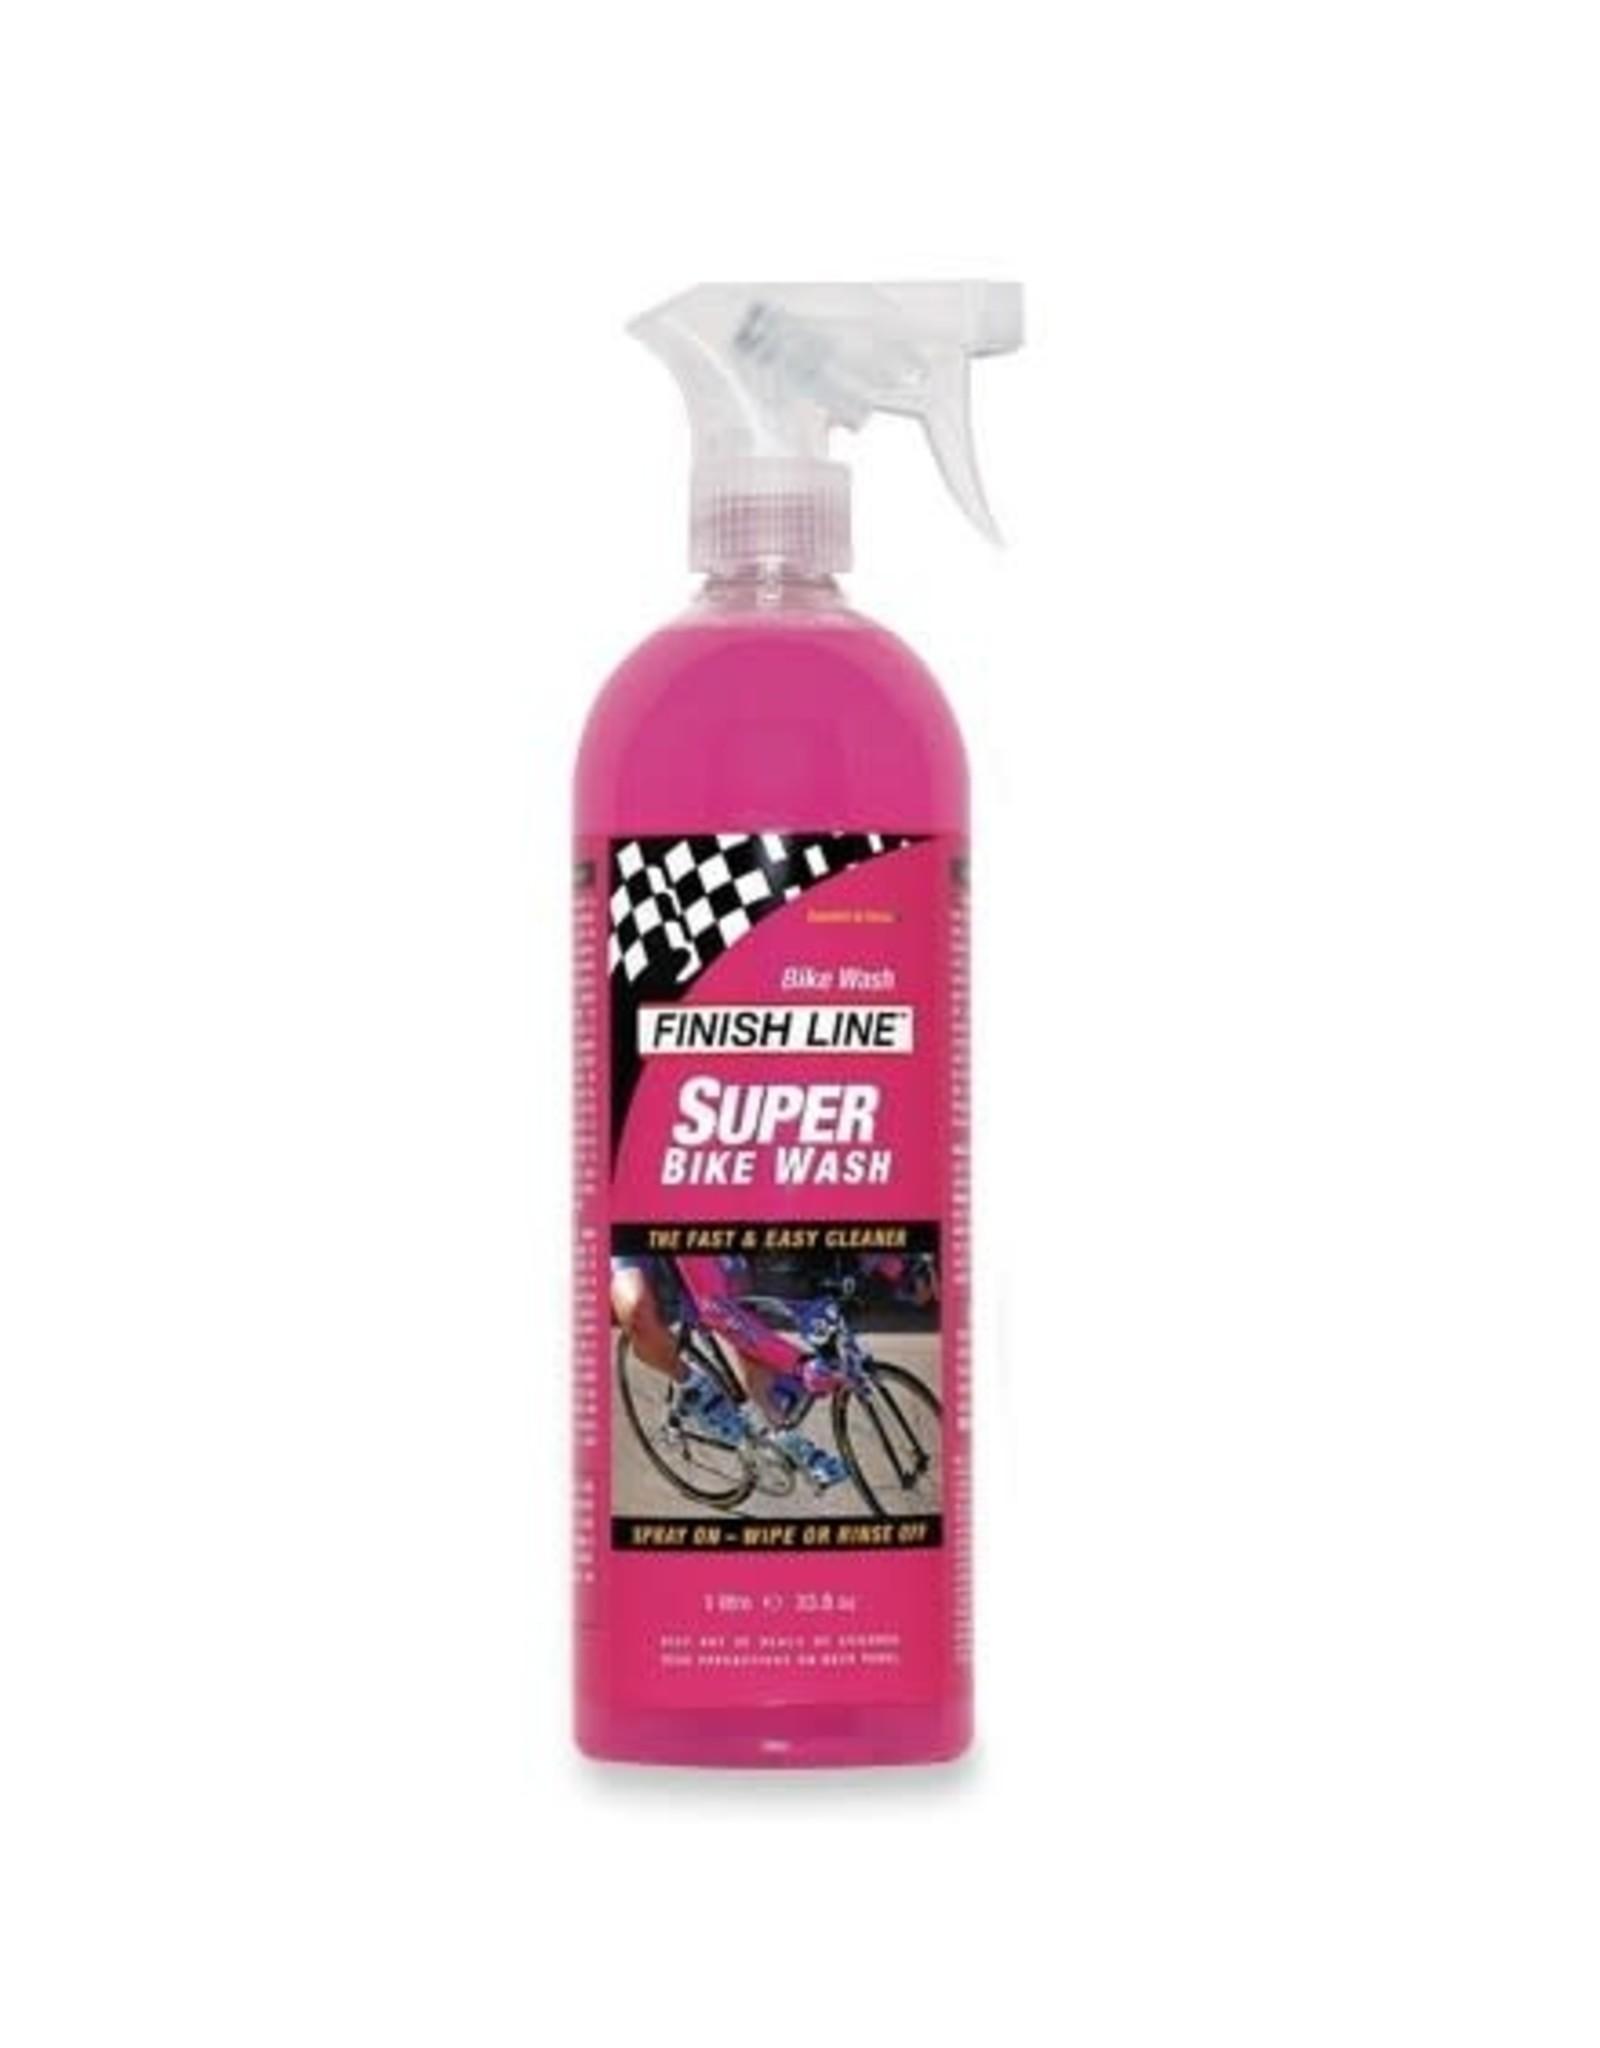 Finish Line Bike Wash Finish Line 1 Litre Spray 6/cs Single